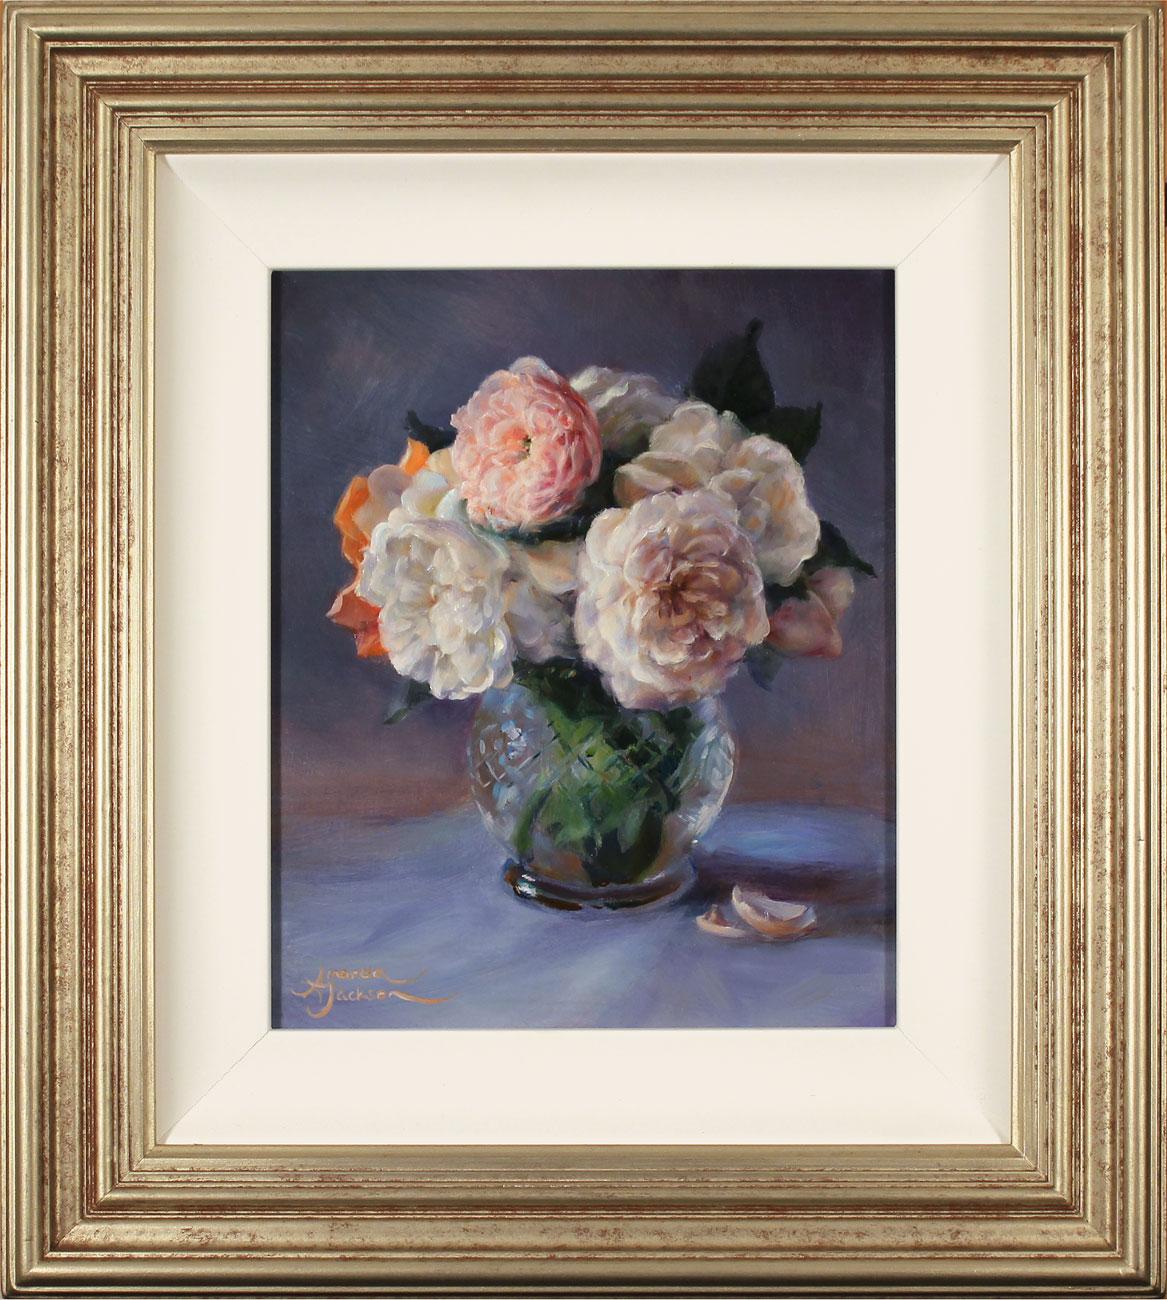 Amanda Jackson, Original oil painting on panel, Garden Bouquet . Click to enlarge